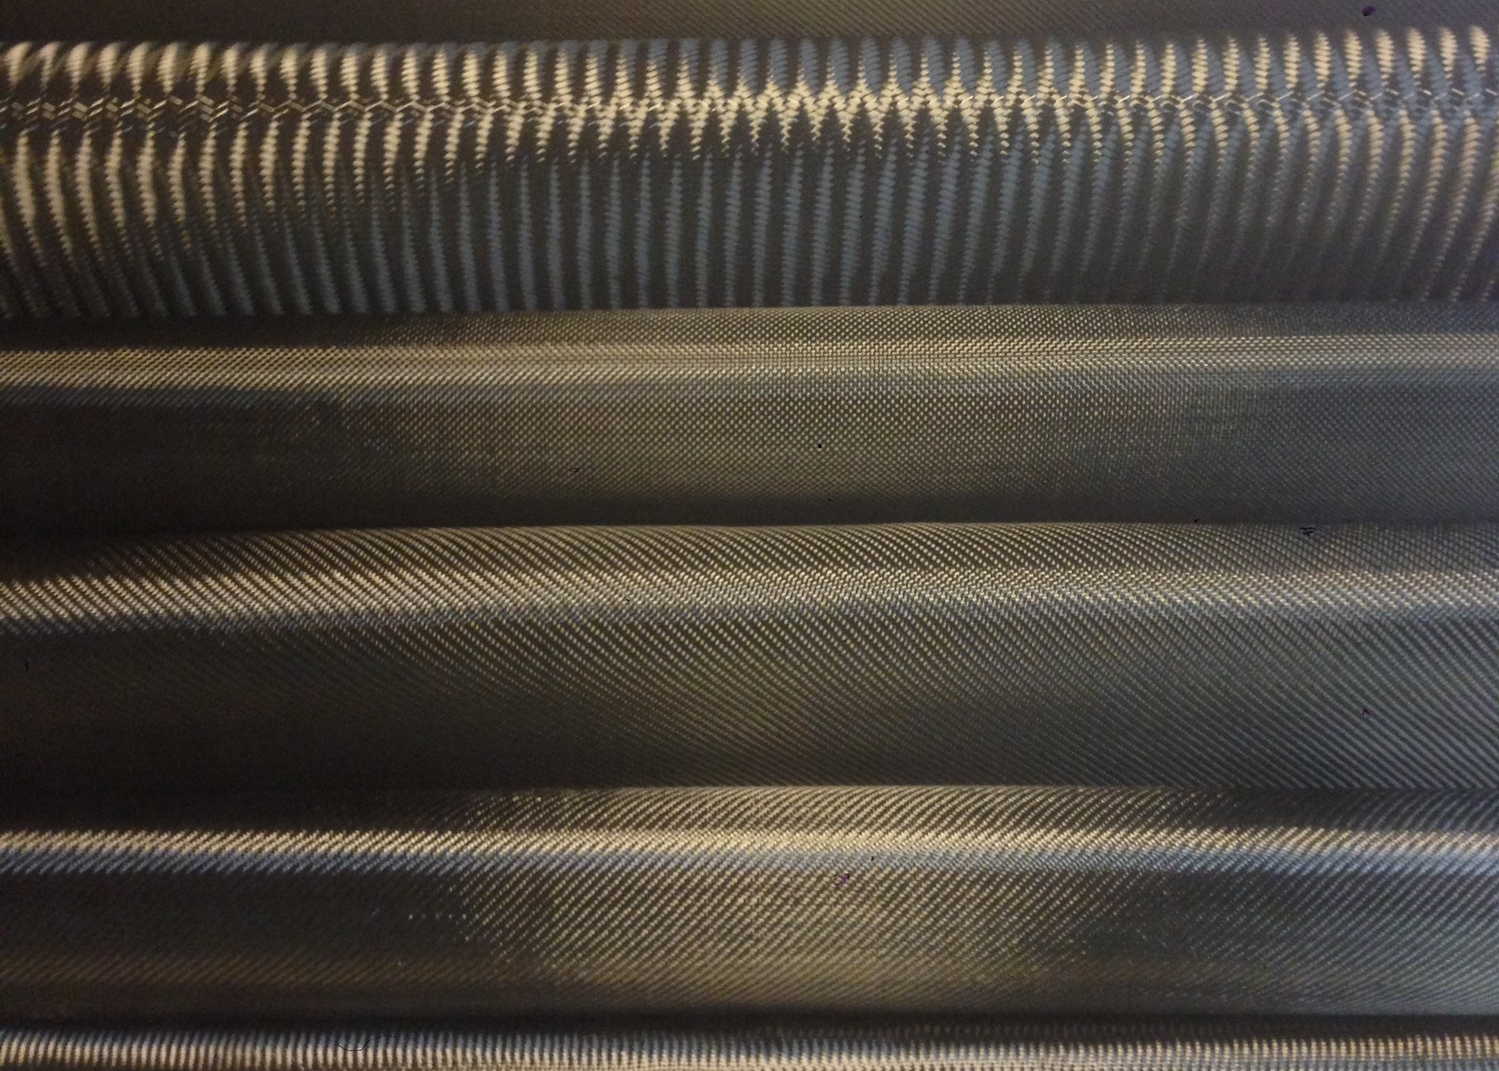 We use aerospace grade carbon fiber.